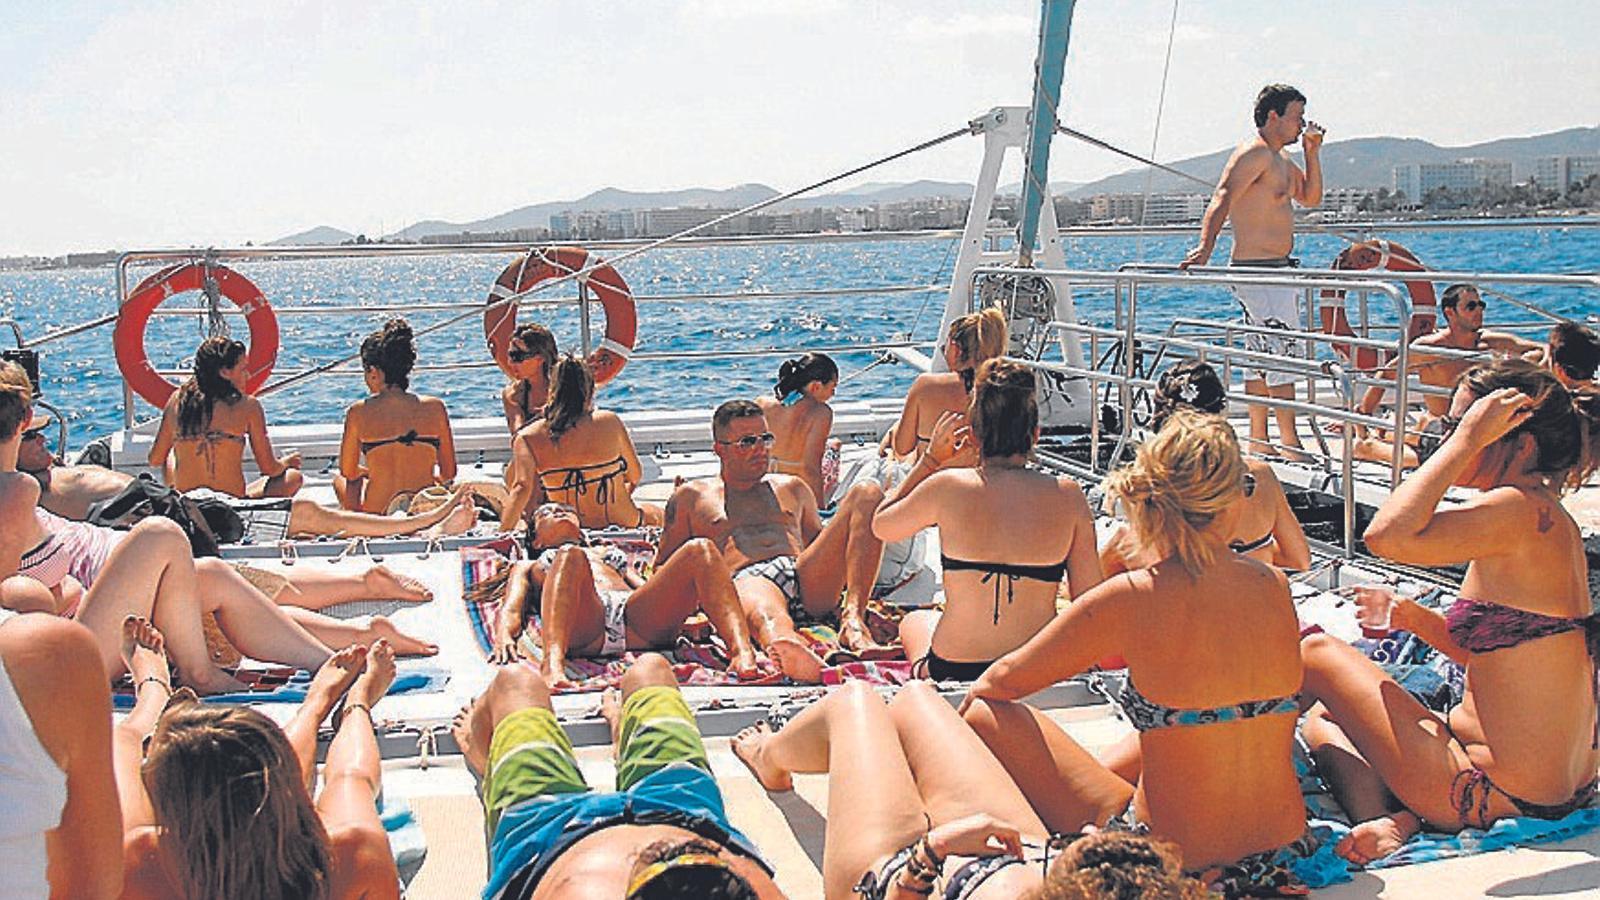 Imatge 20140717_party boat_AB02